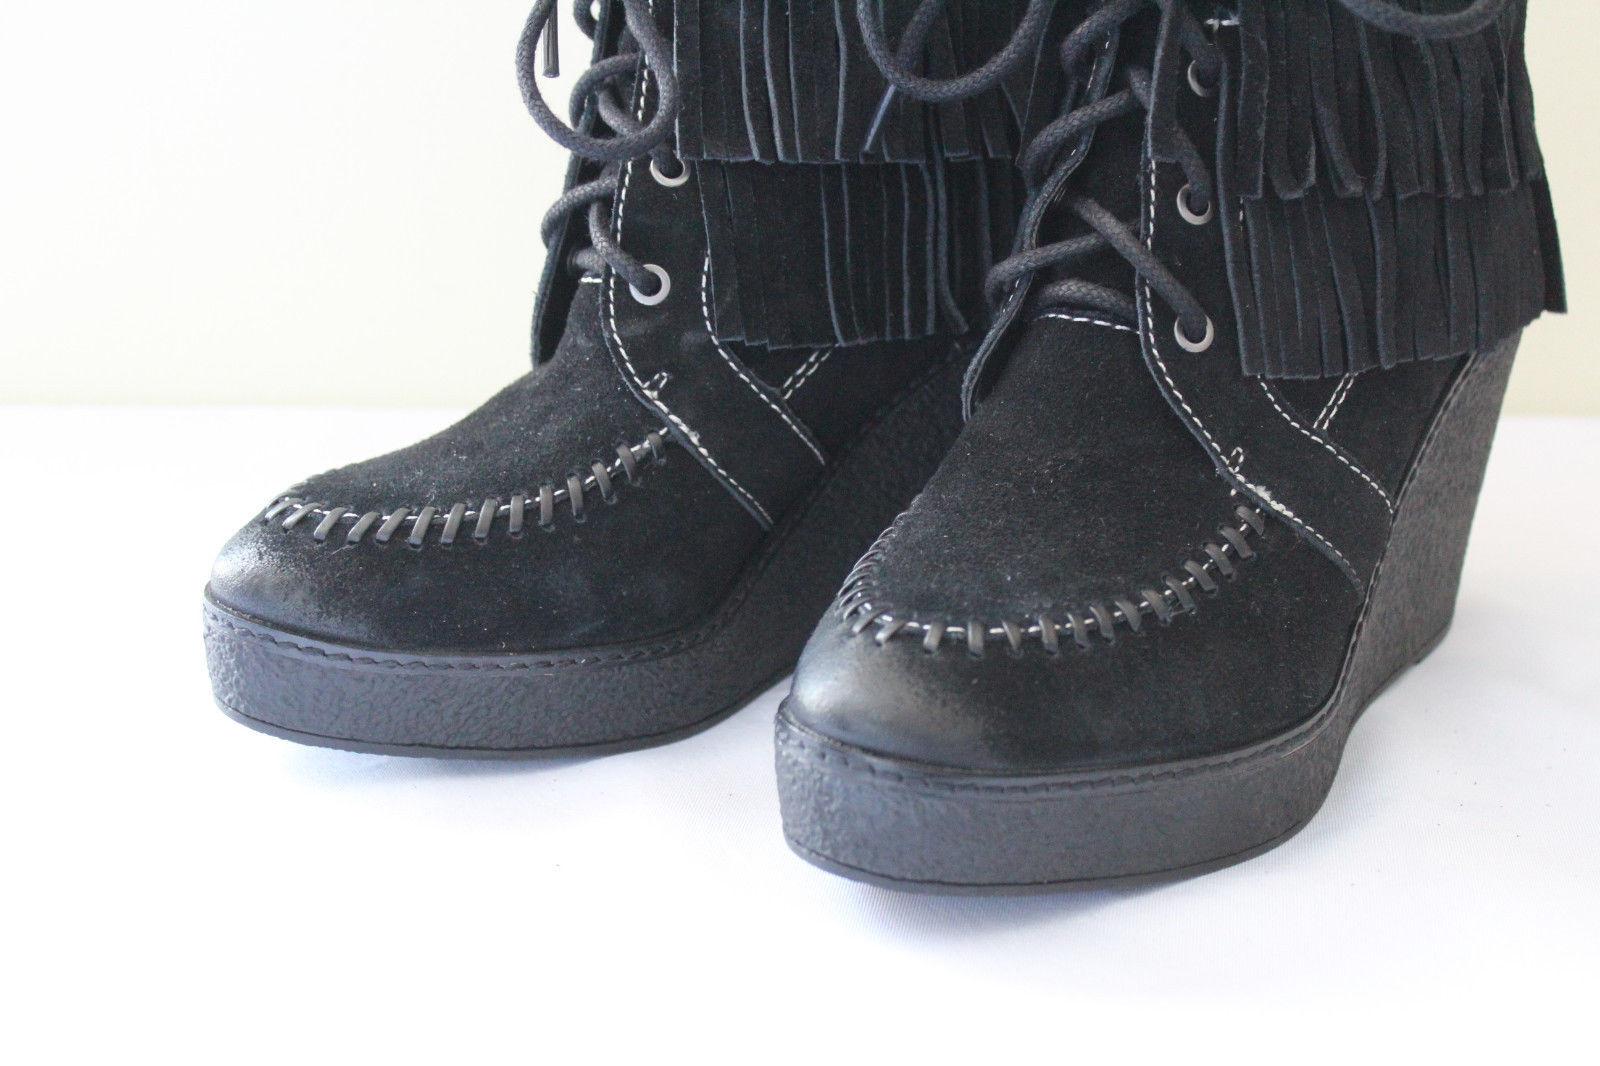 5a496d1d6df1 Sam Edelman Black Suede Leather Fringe Studded Kemper Boots 7 M  150